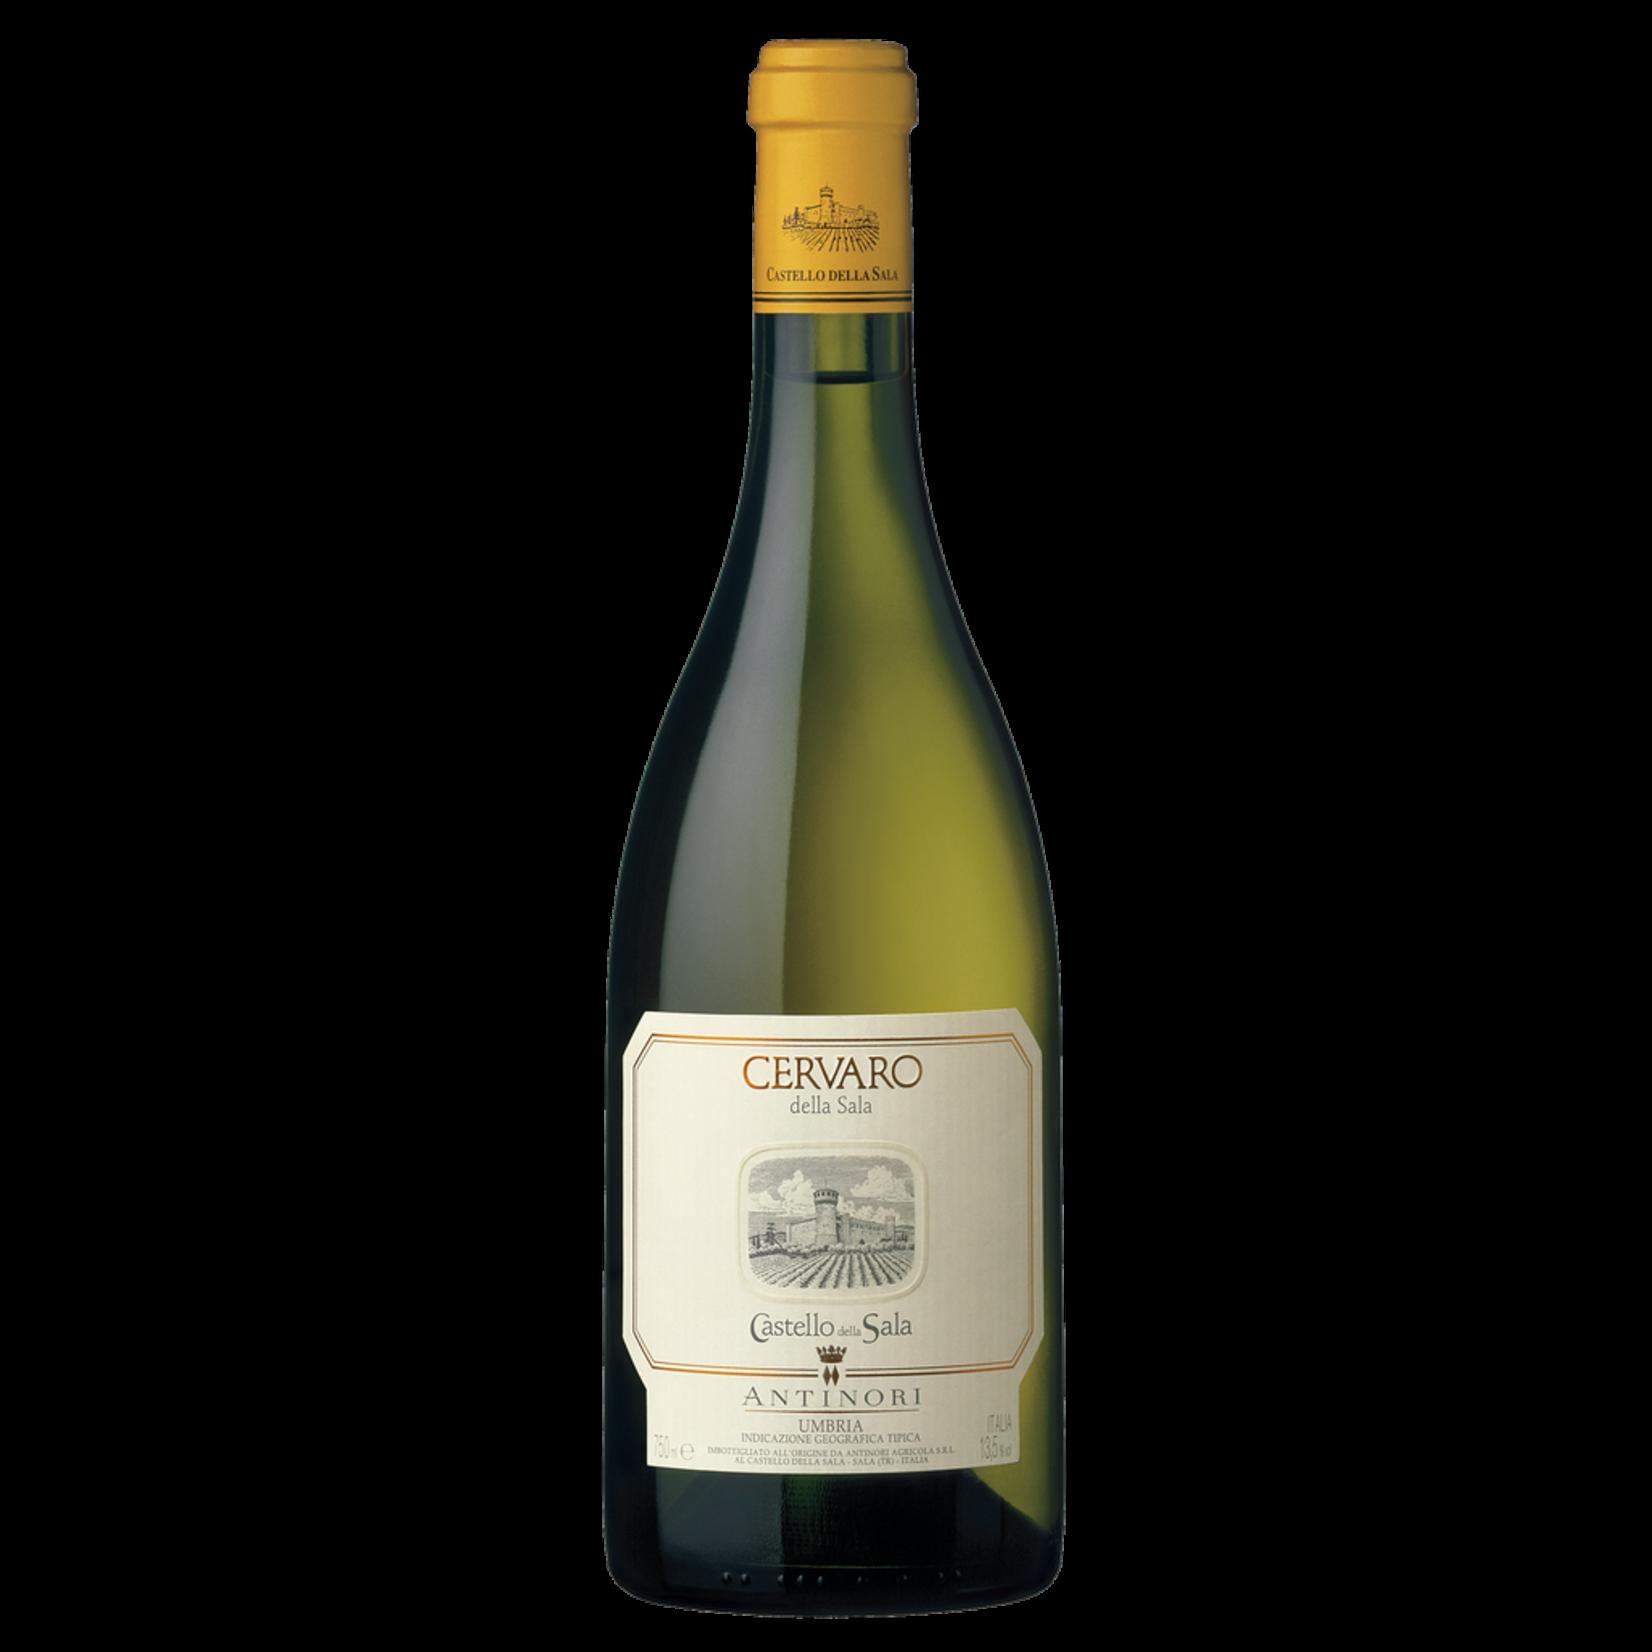 Antinori Castello della Sala Cervaro Chardonnay 2018